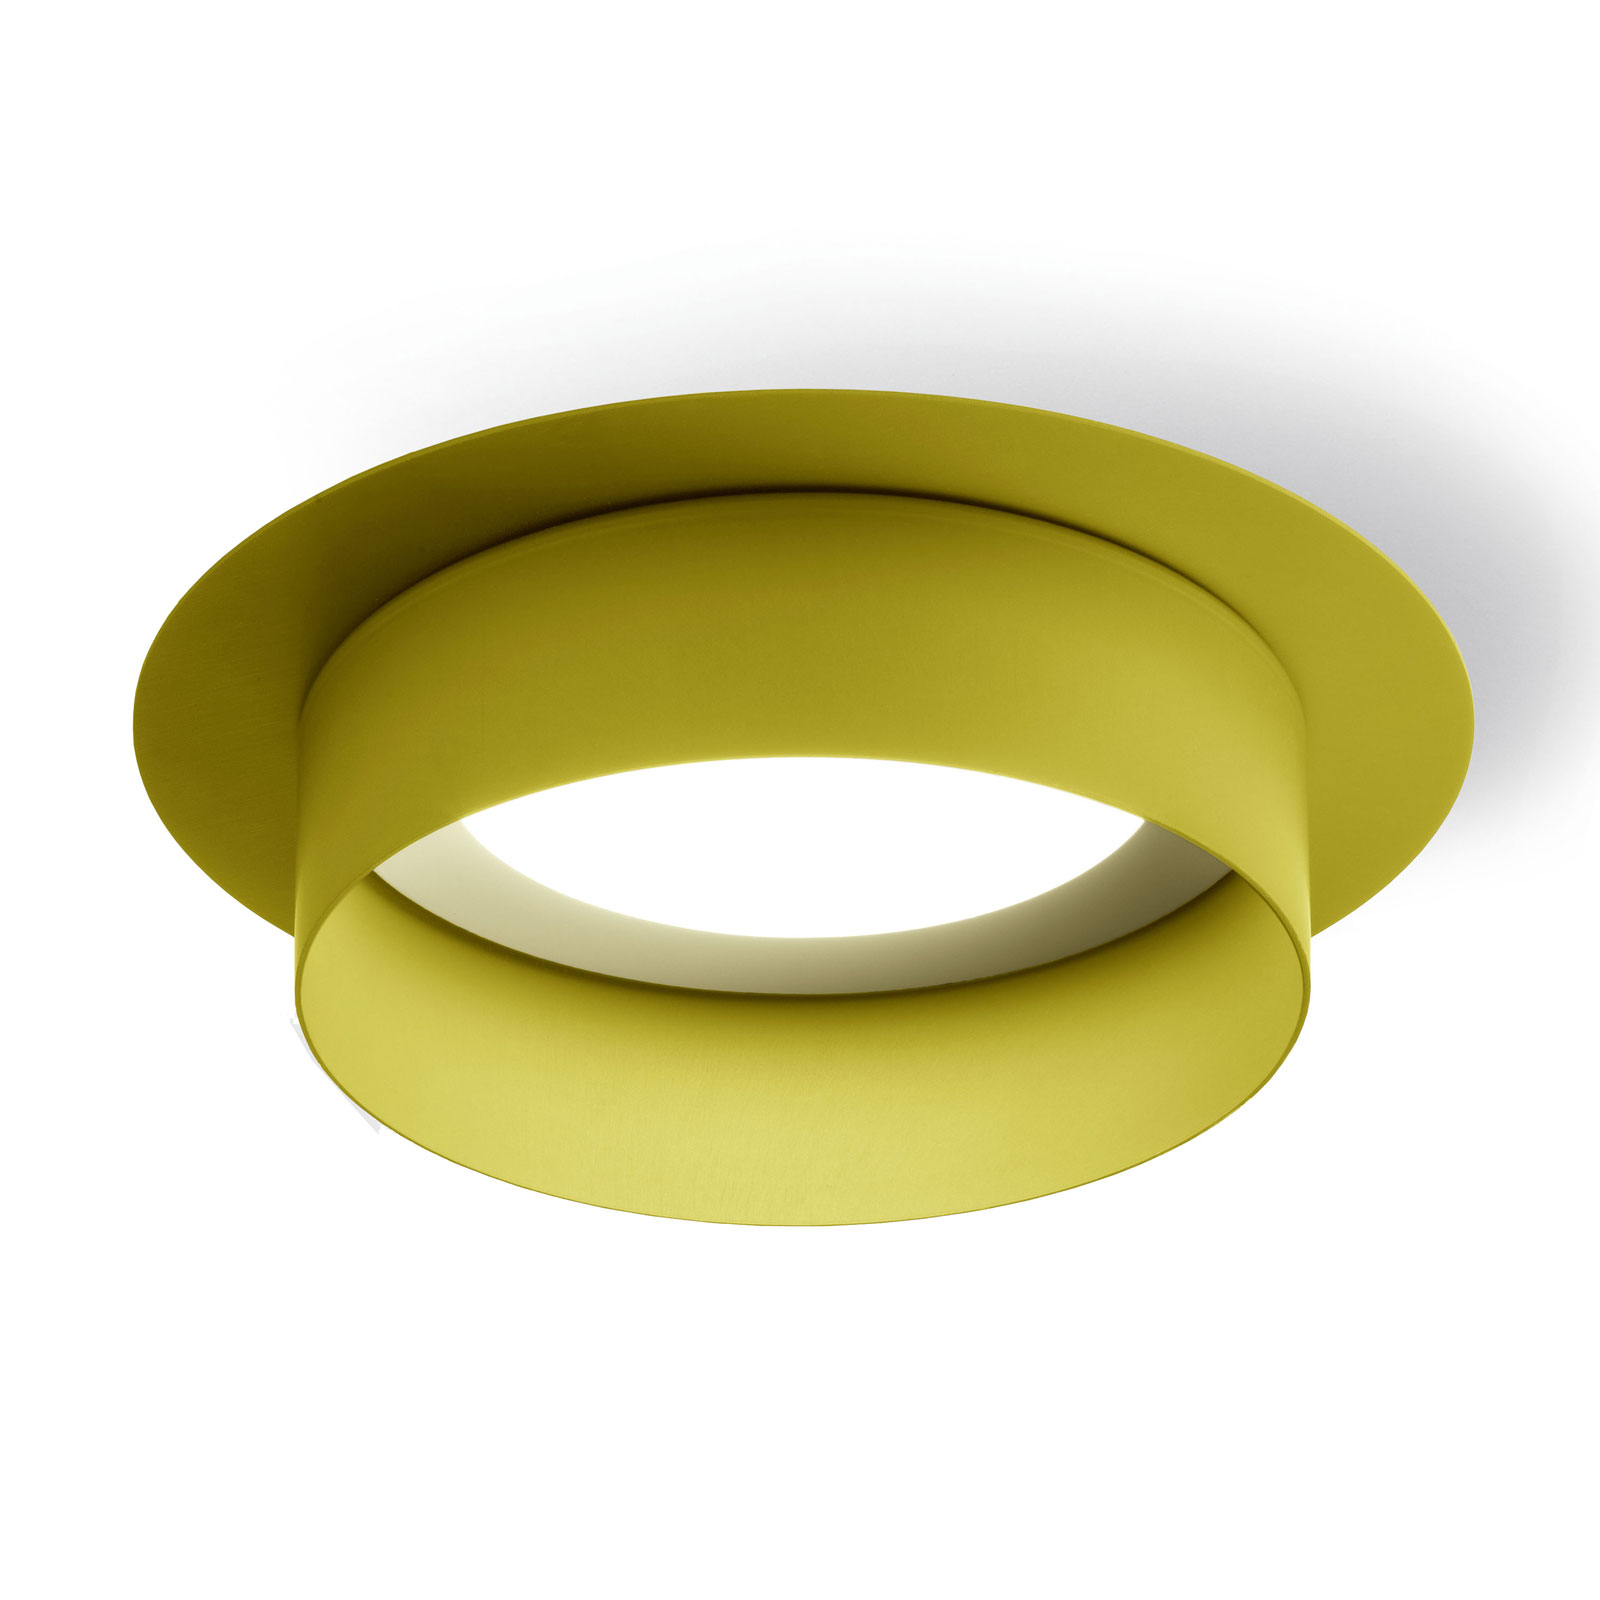 Modo Luce Hammer kattovalaisin, Ø 18 cm, sitruuna